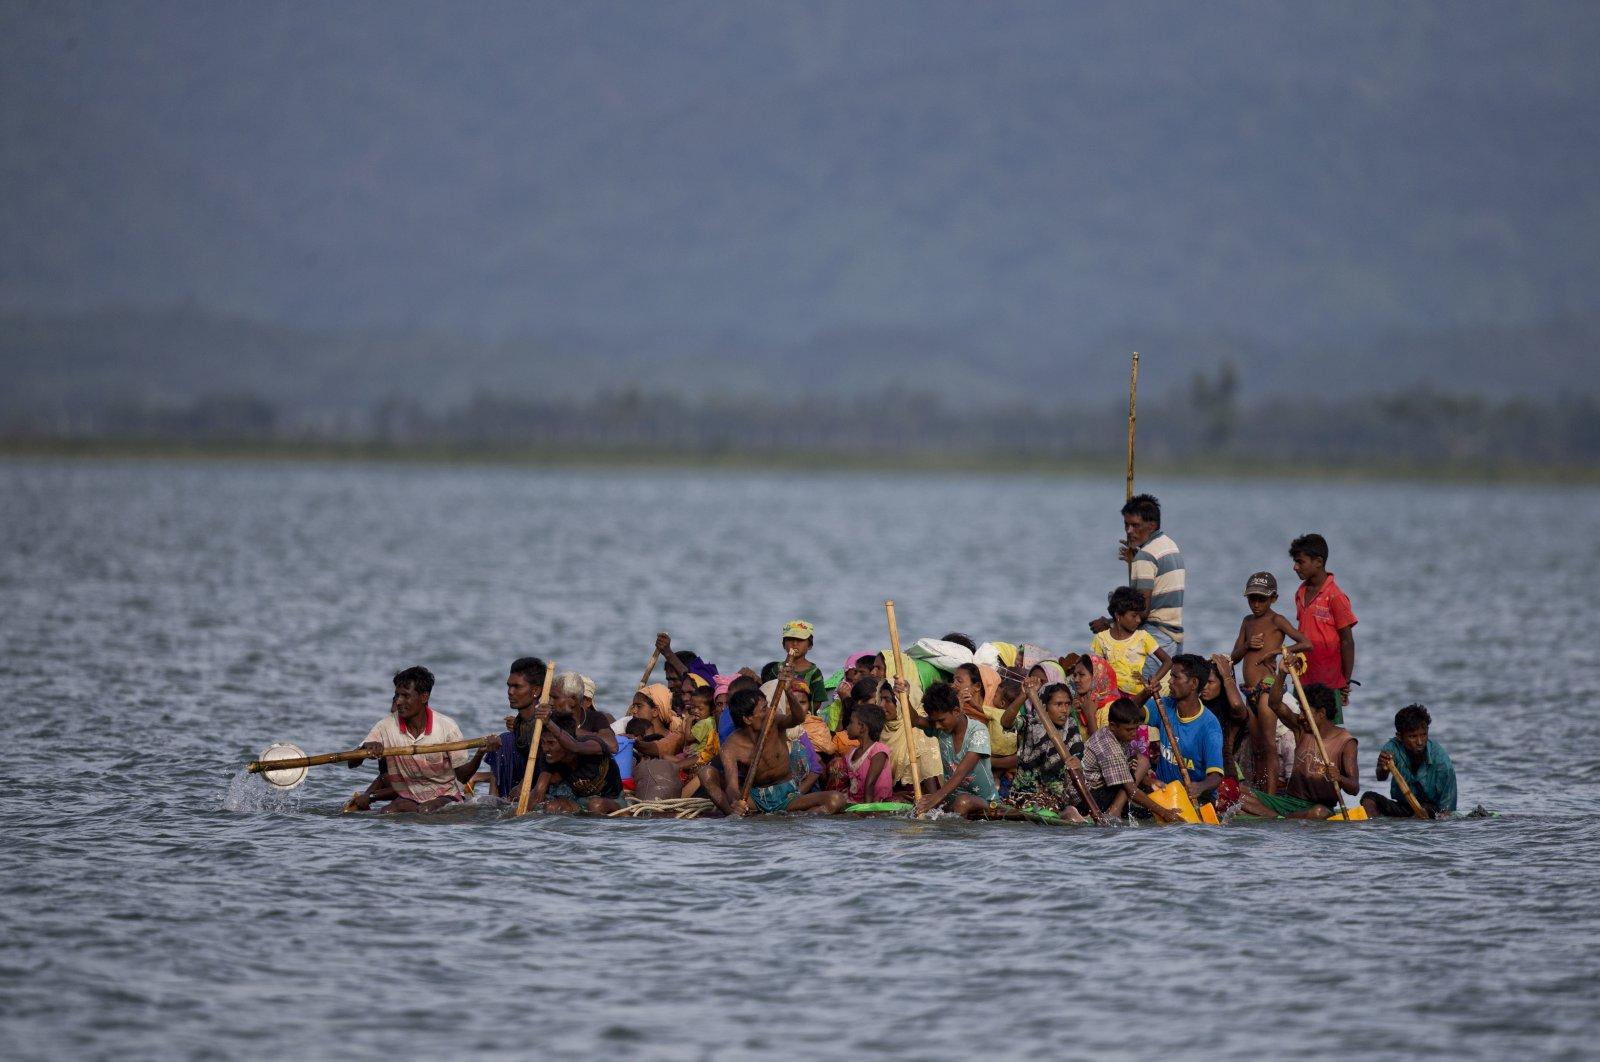 Rohingya Muslims use a makeshift raft made with plastic containers to cross the Naf river from Myanmar into Bangladesh, near Shah Porir Dwip, Bangladesh, Nov. 12, 2017. (AP Photo)